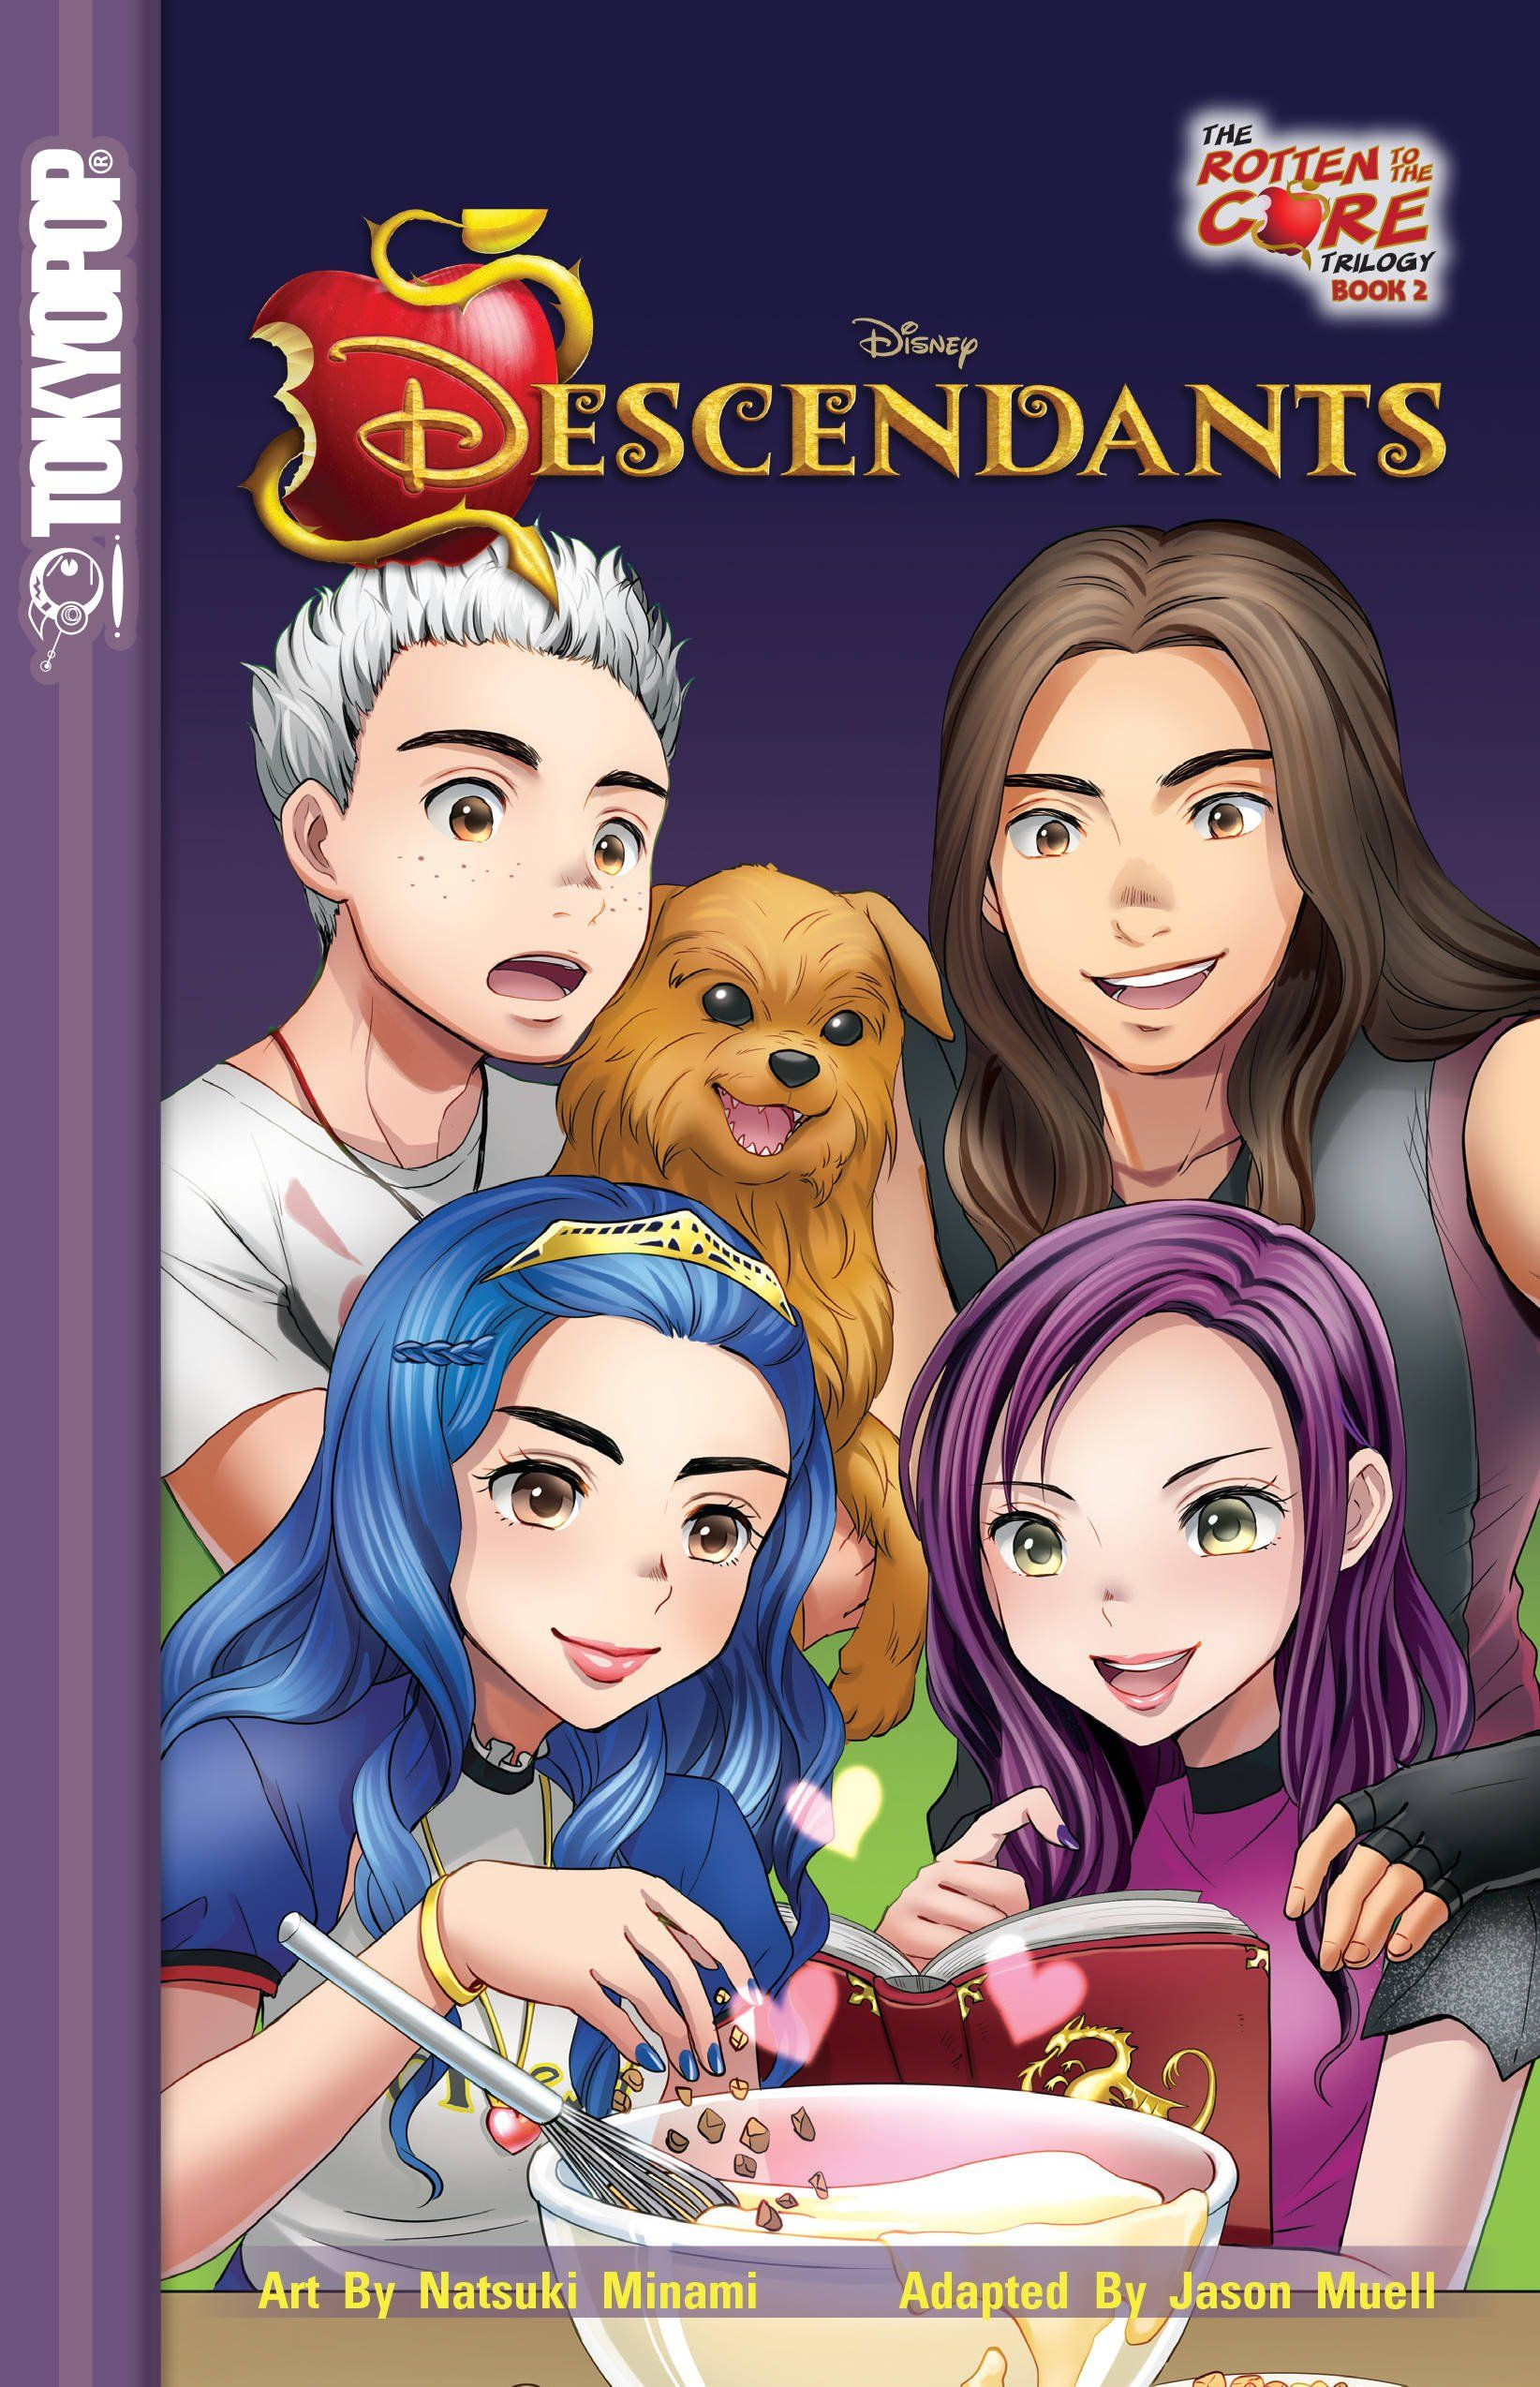 Disney's Descendants Rotten to the Core